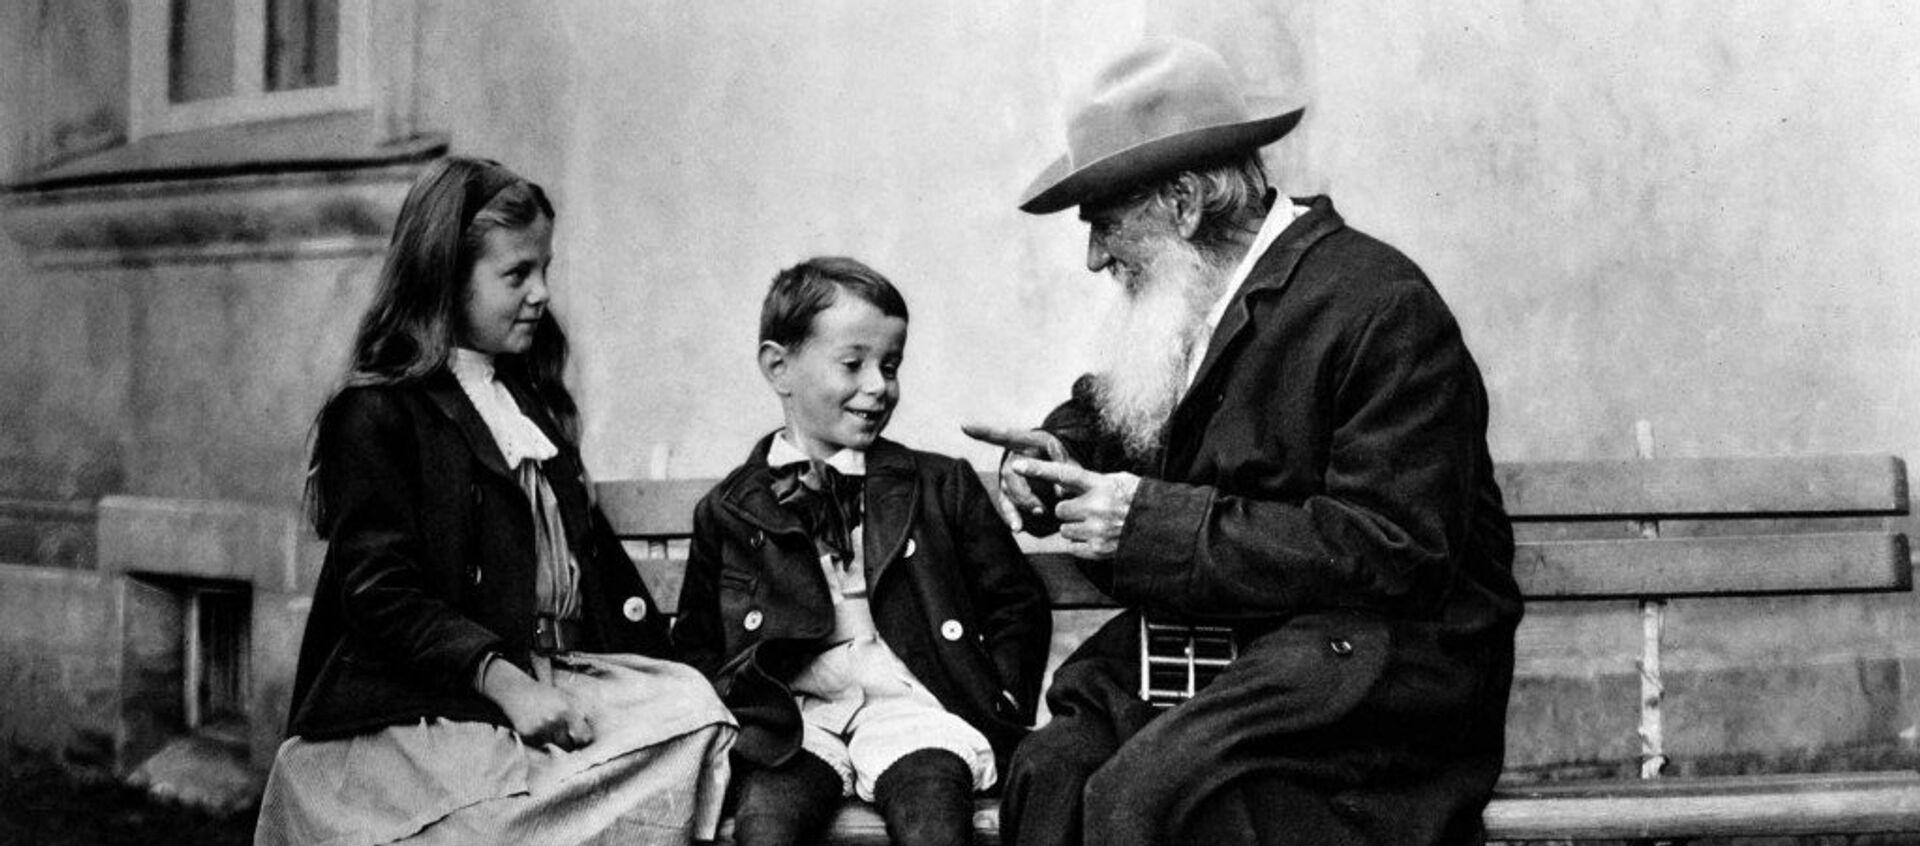 León Tolstói (dcha.) con sus nietos - Sputnik Mundo, 1920, 19.03.2016